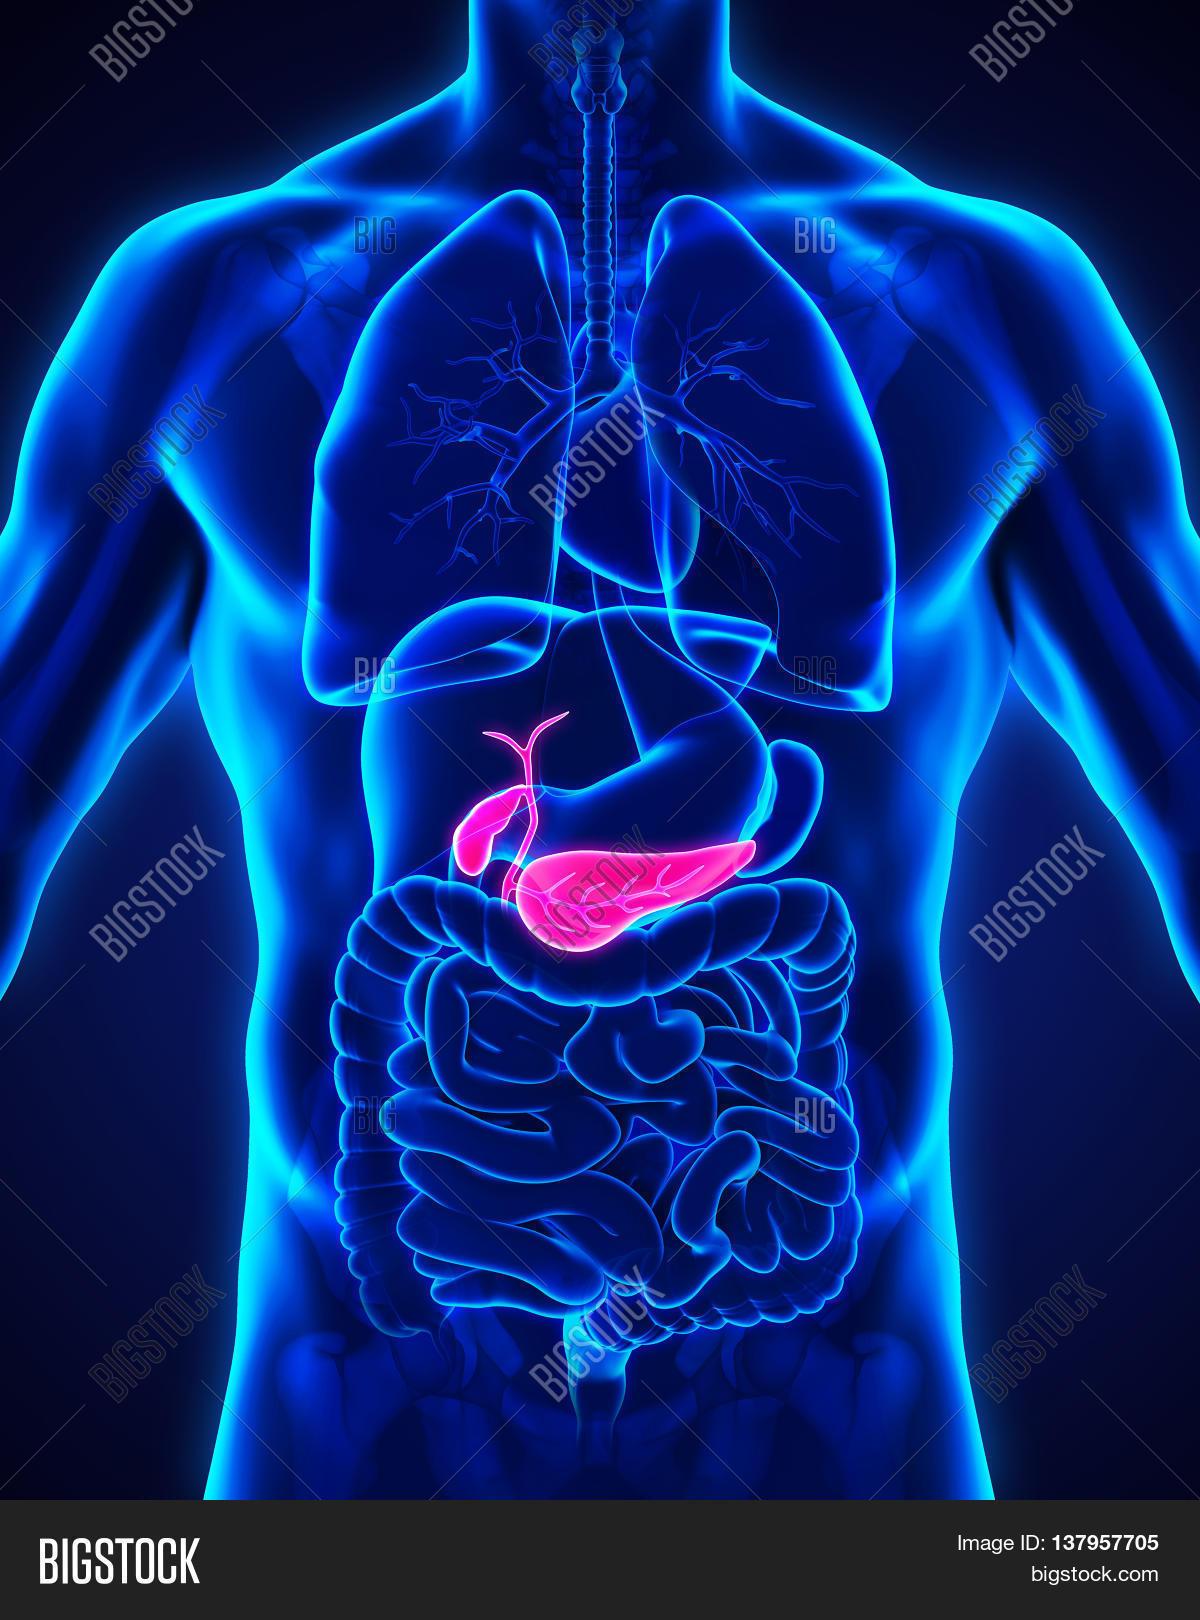 Human Gallbladder Image & Photo (Free Trial) | Bigstock